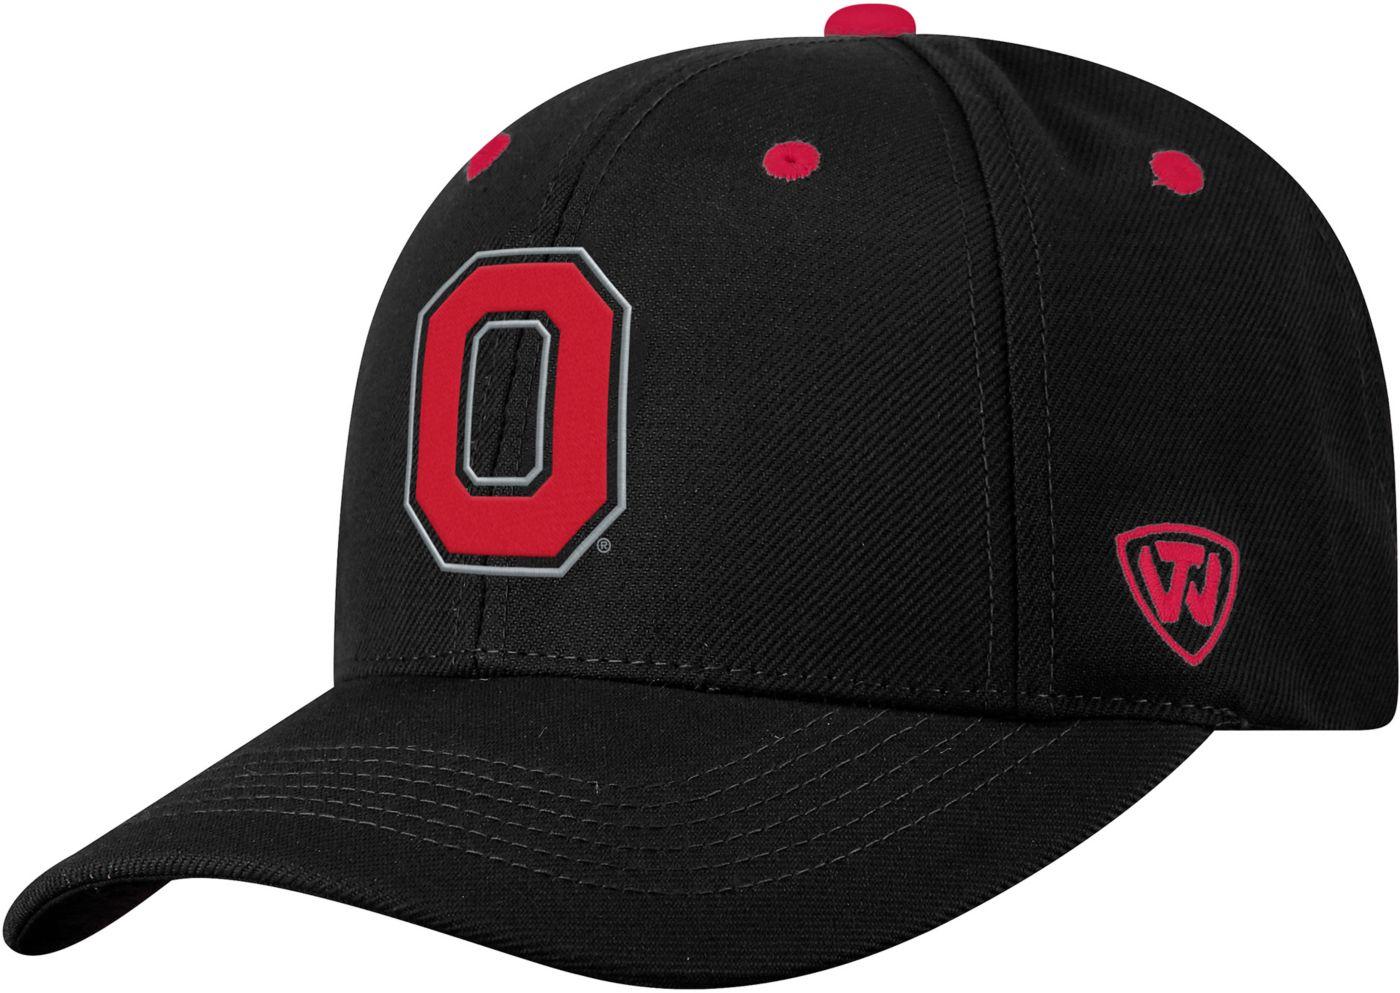 Top of the World Men's Ohio State Buckeyes Triple Threat Adjustable Black Hat